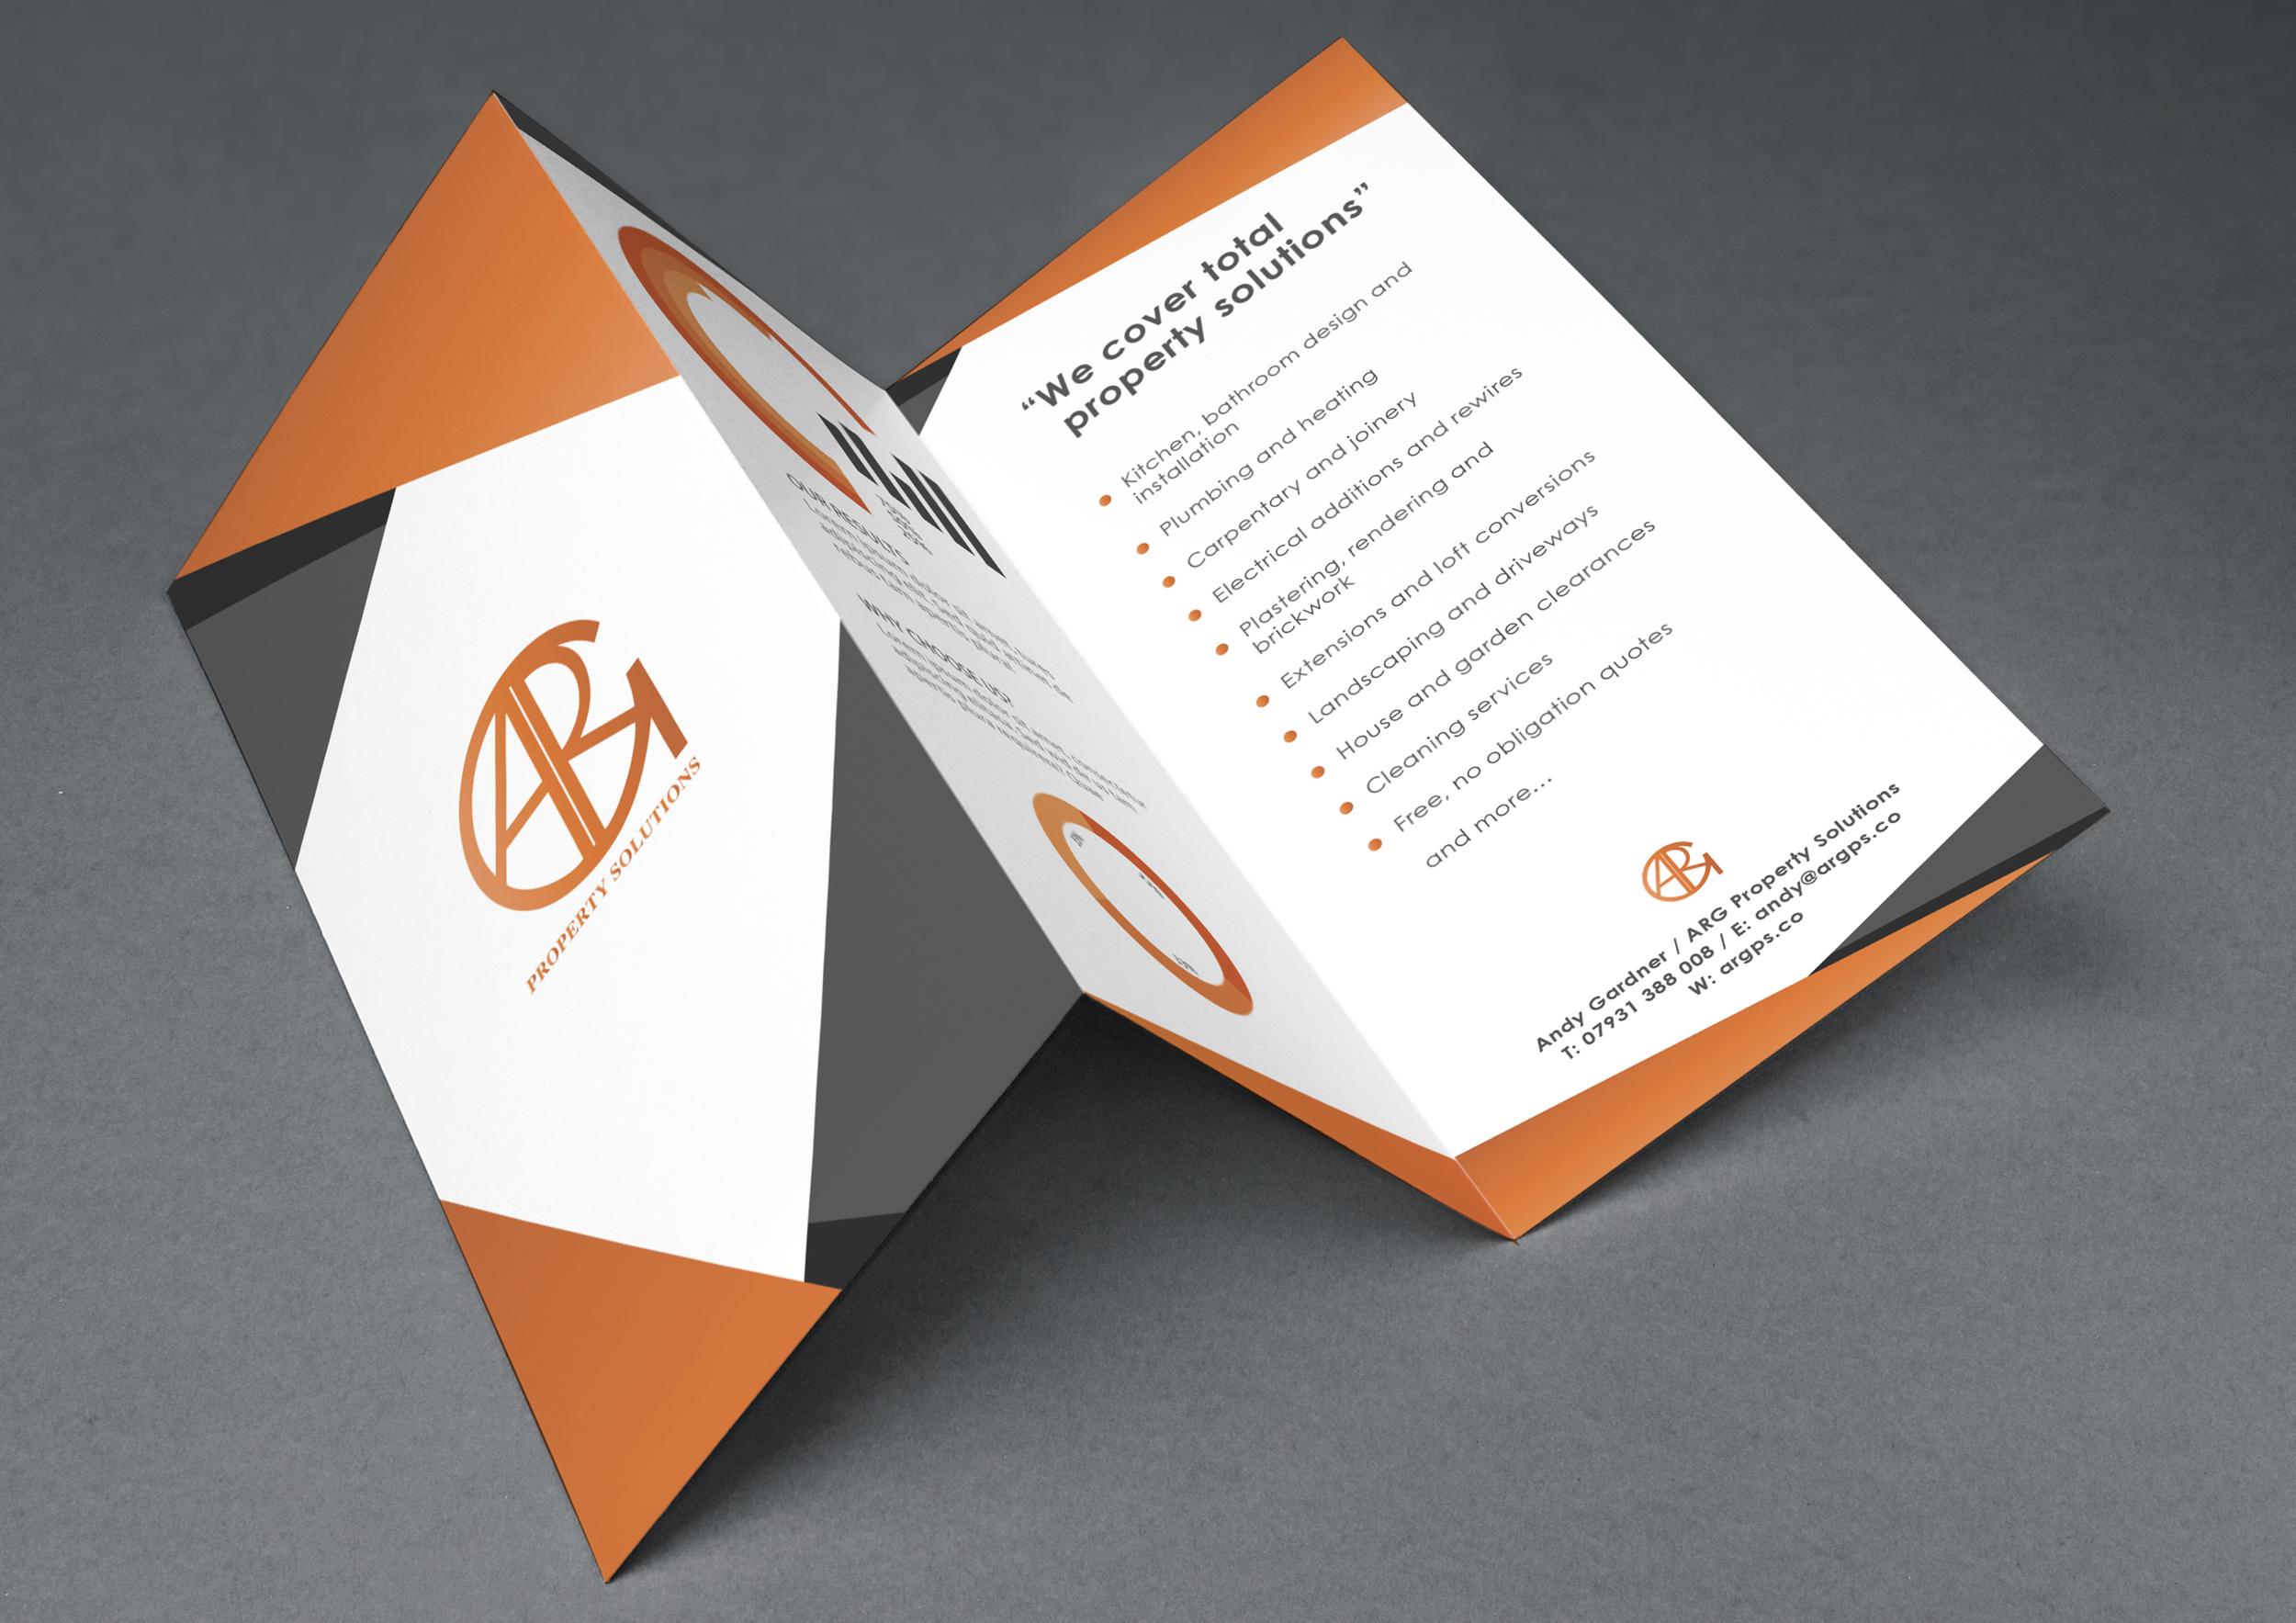 flyers2.jpg